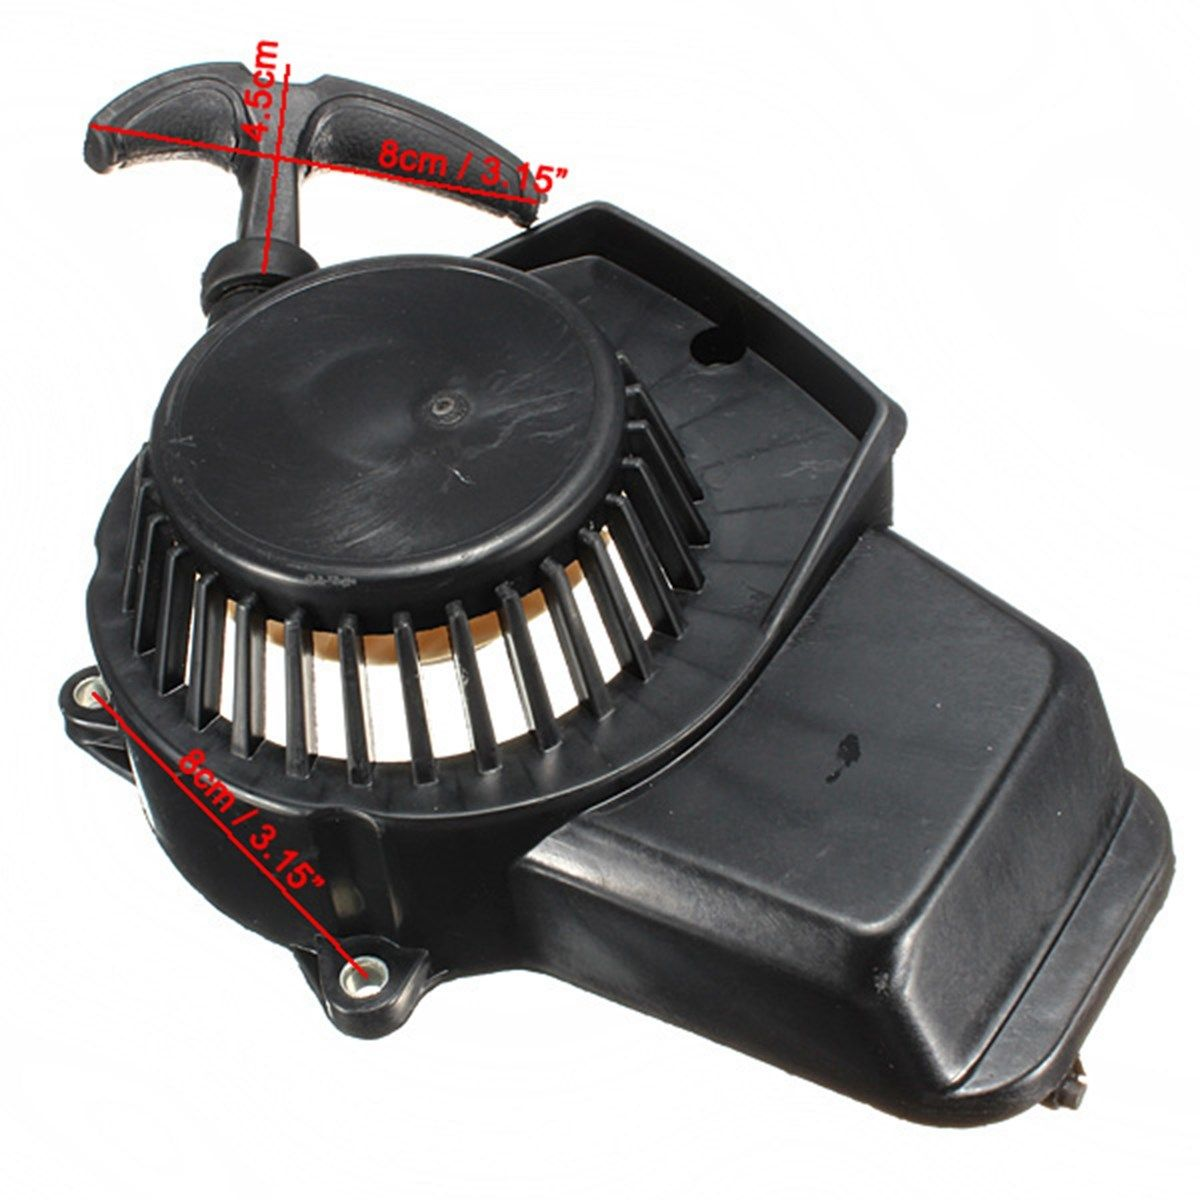 47cc 49cc Pit Dirt Bike Minimoto Mini Quad Pull Start Starter Cord Pullstart Cog